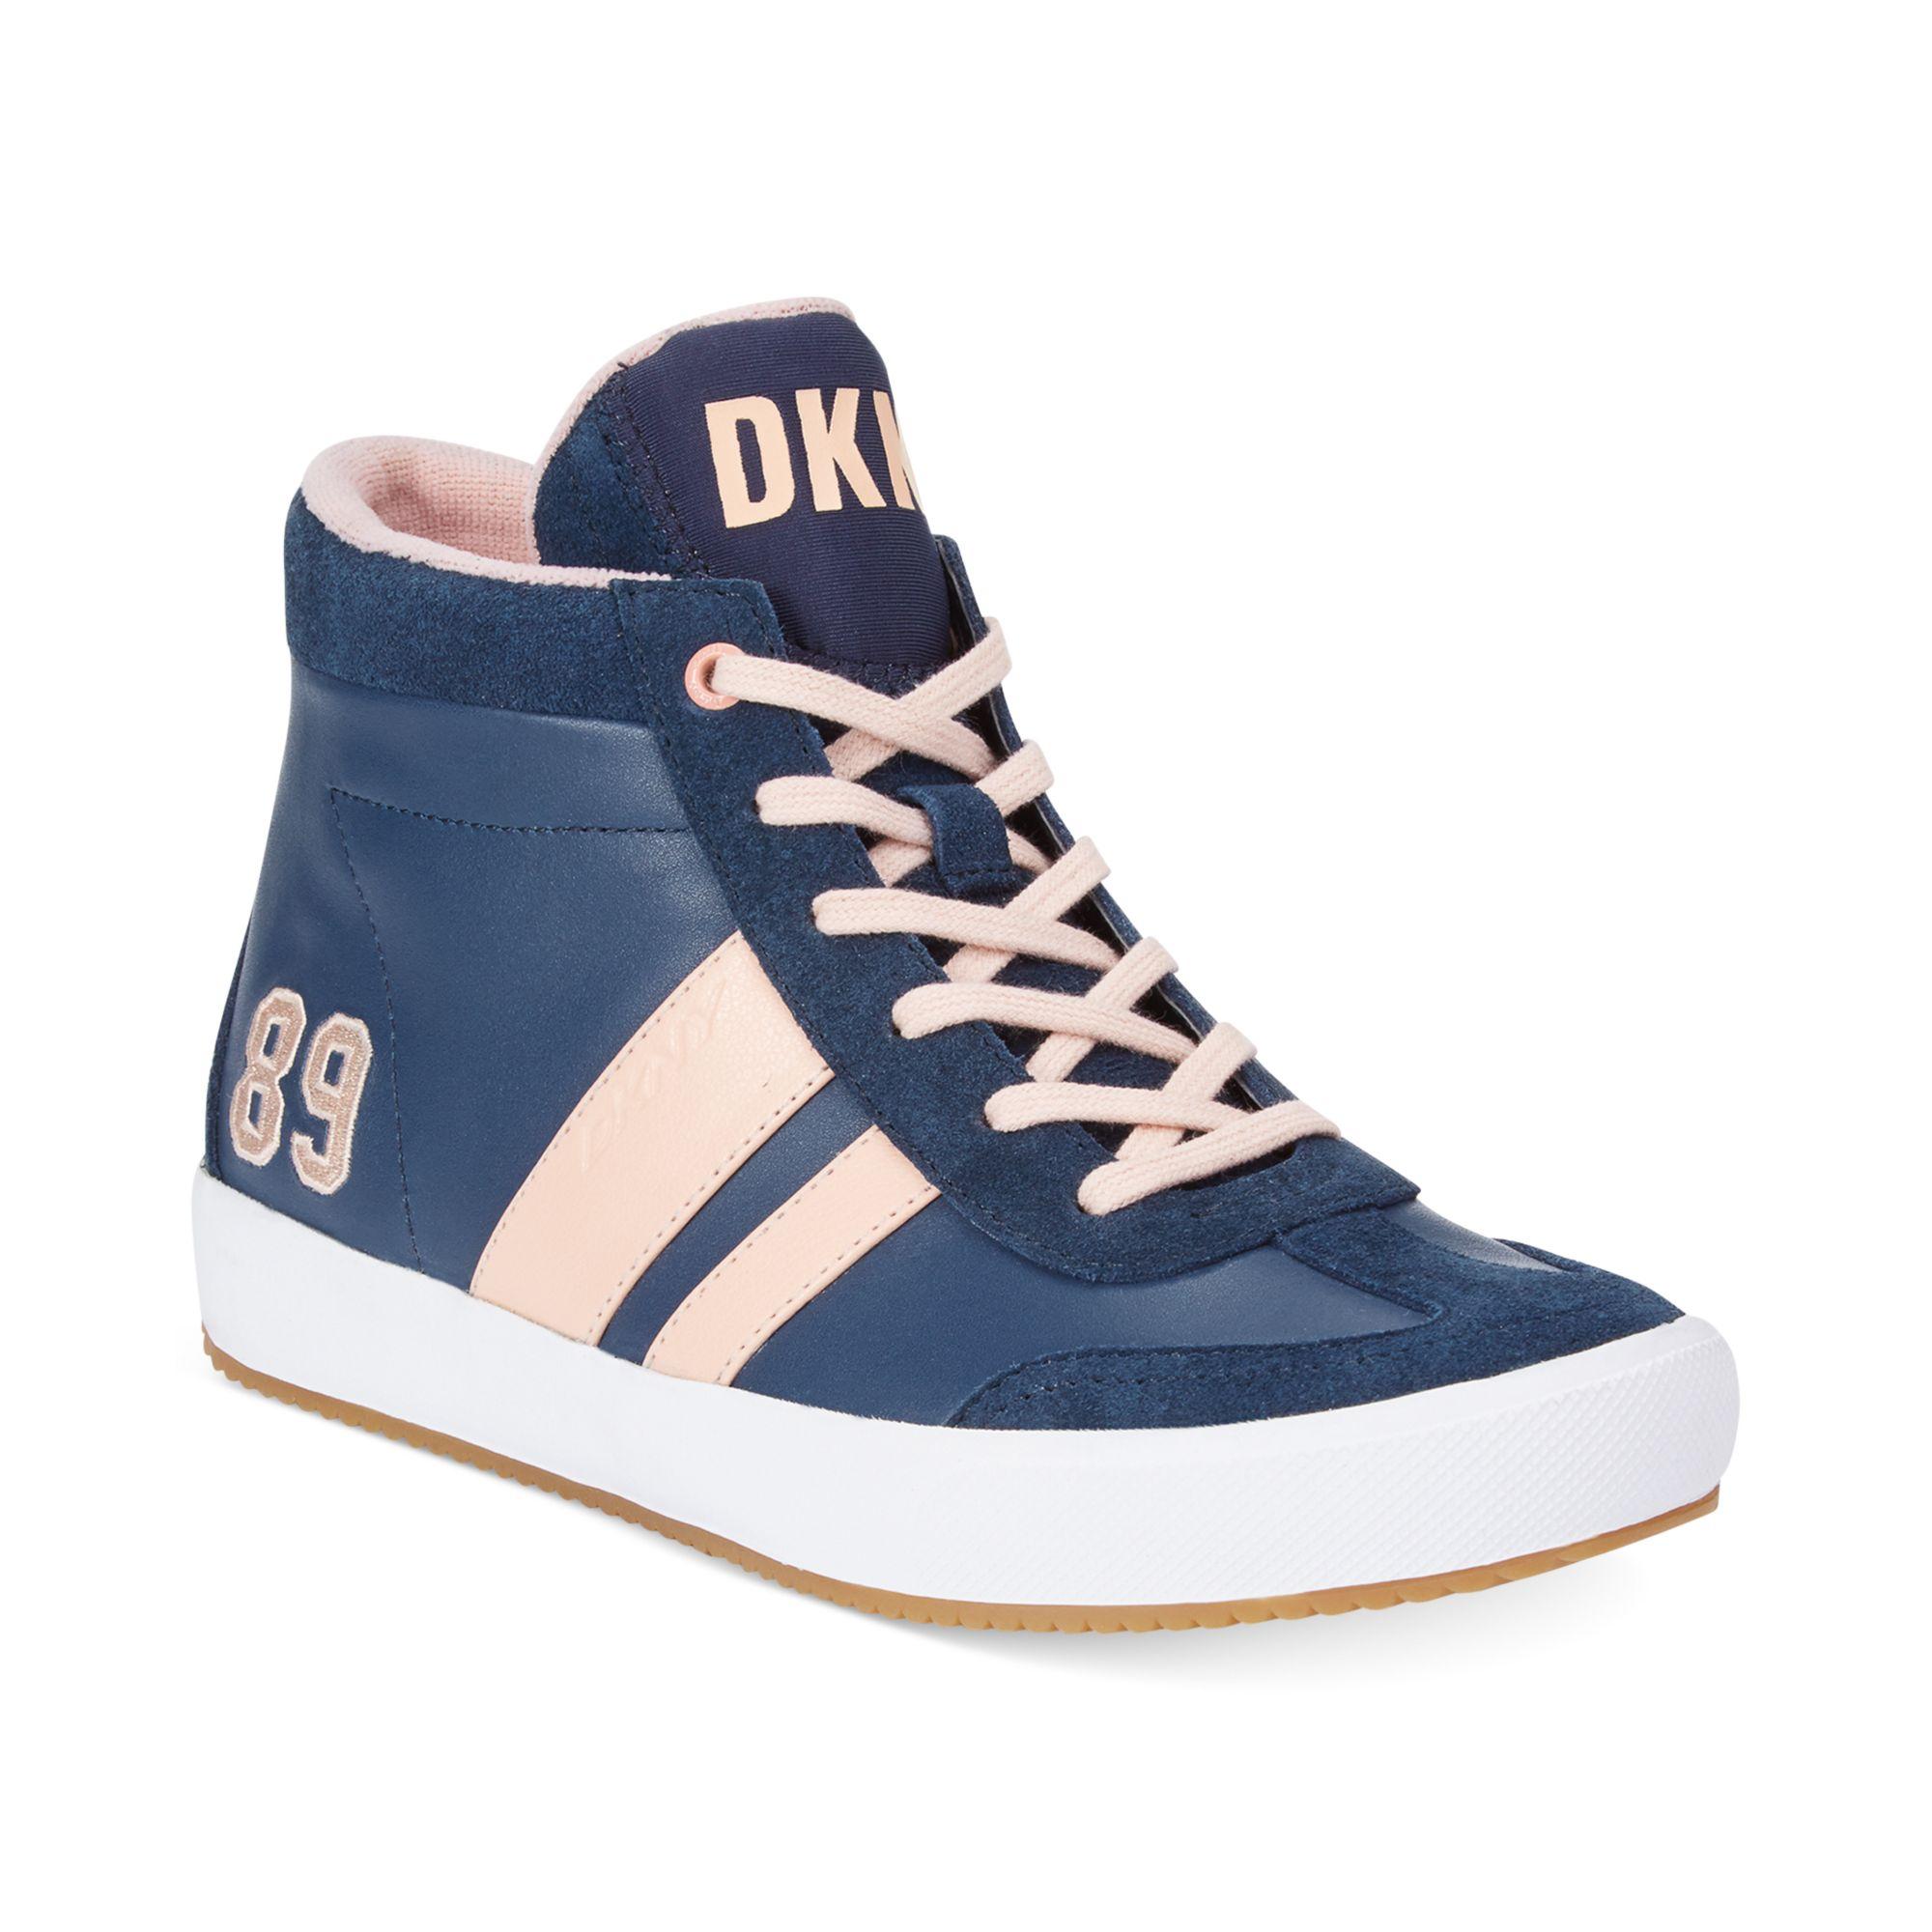 Lyst Dkny Kooper High Top Sneakers In Blue